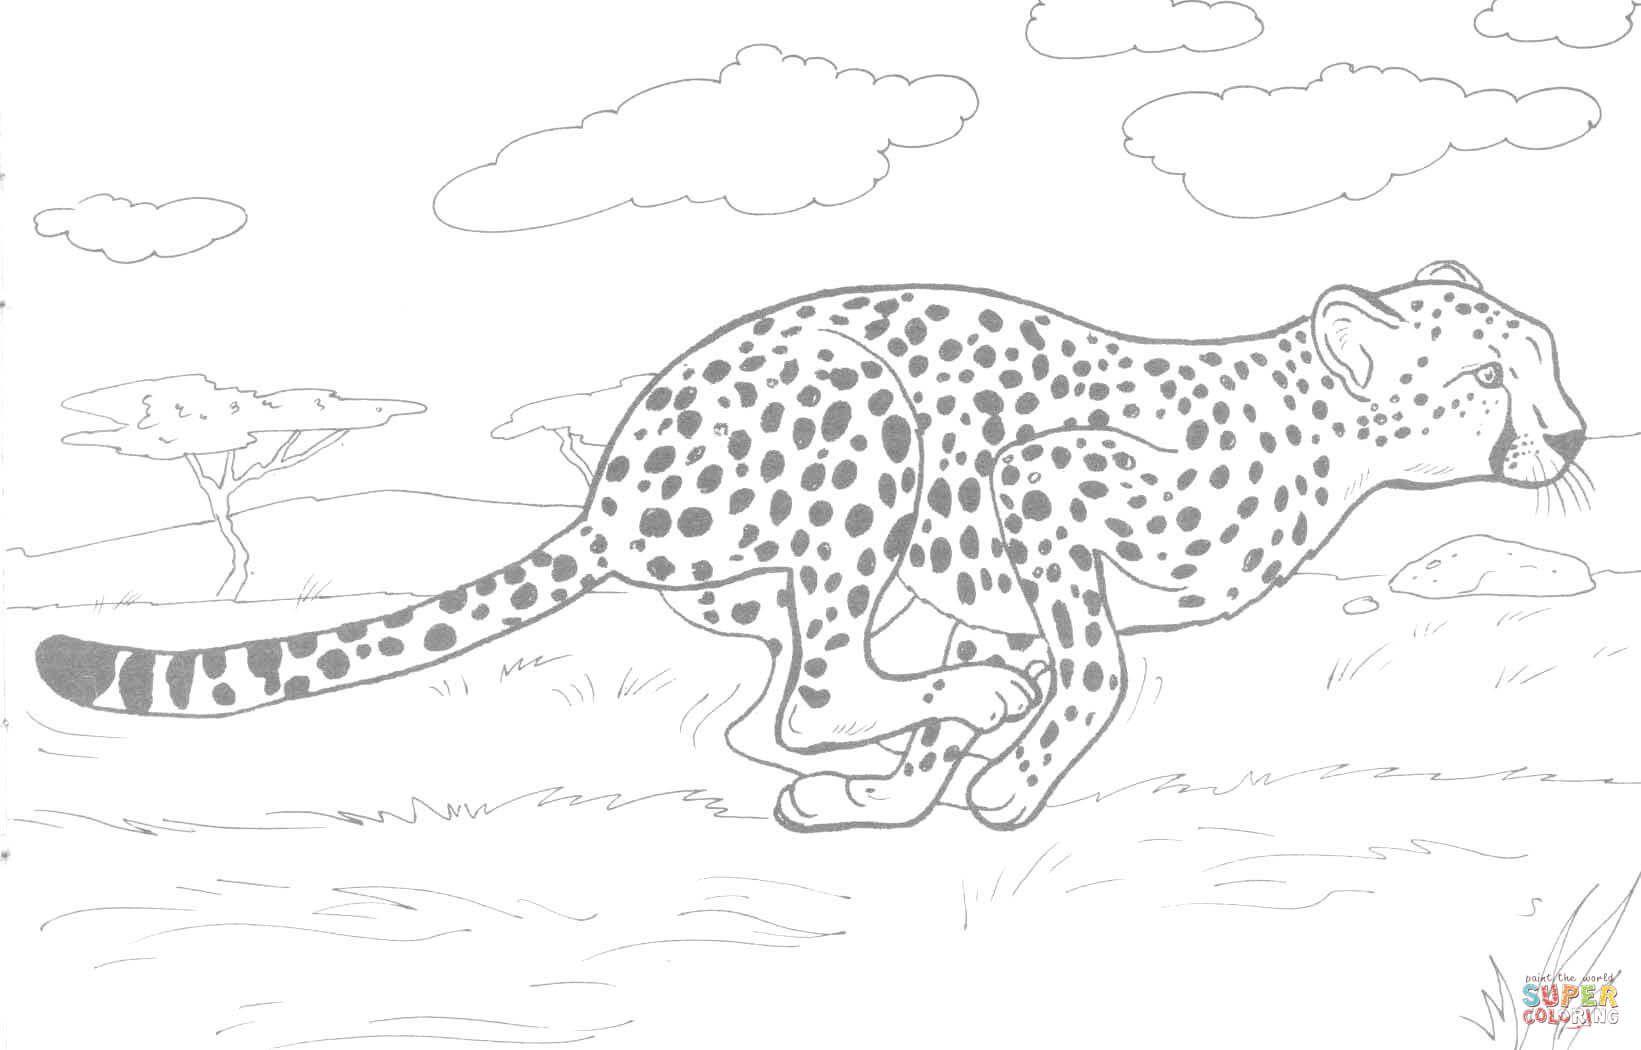 Cheetah Running Coloring Page Free Printable Coloring Pages Animal Coloring Pages Mermaid Coloring Pages Printable Animal Pictures [ 1050 x 1641 Pixel ]